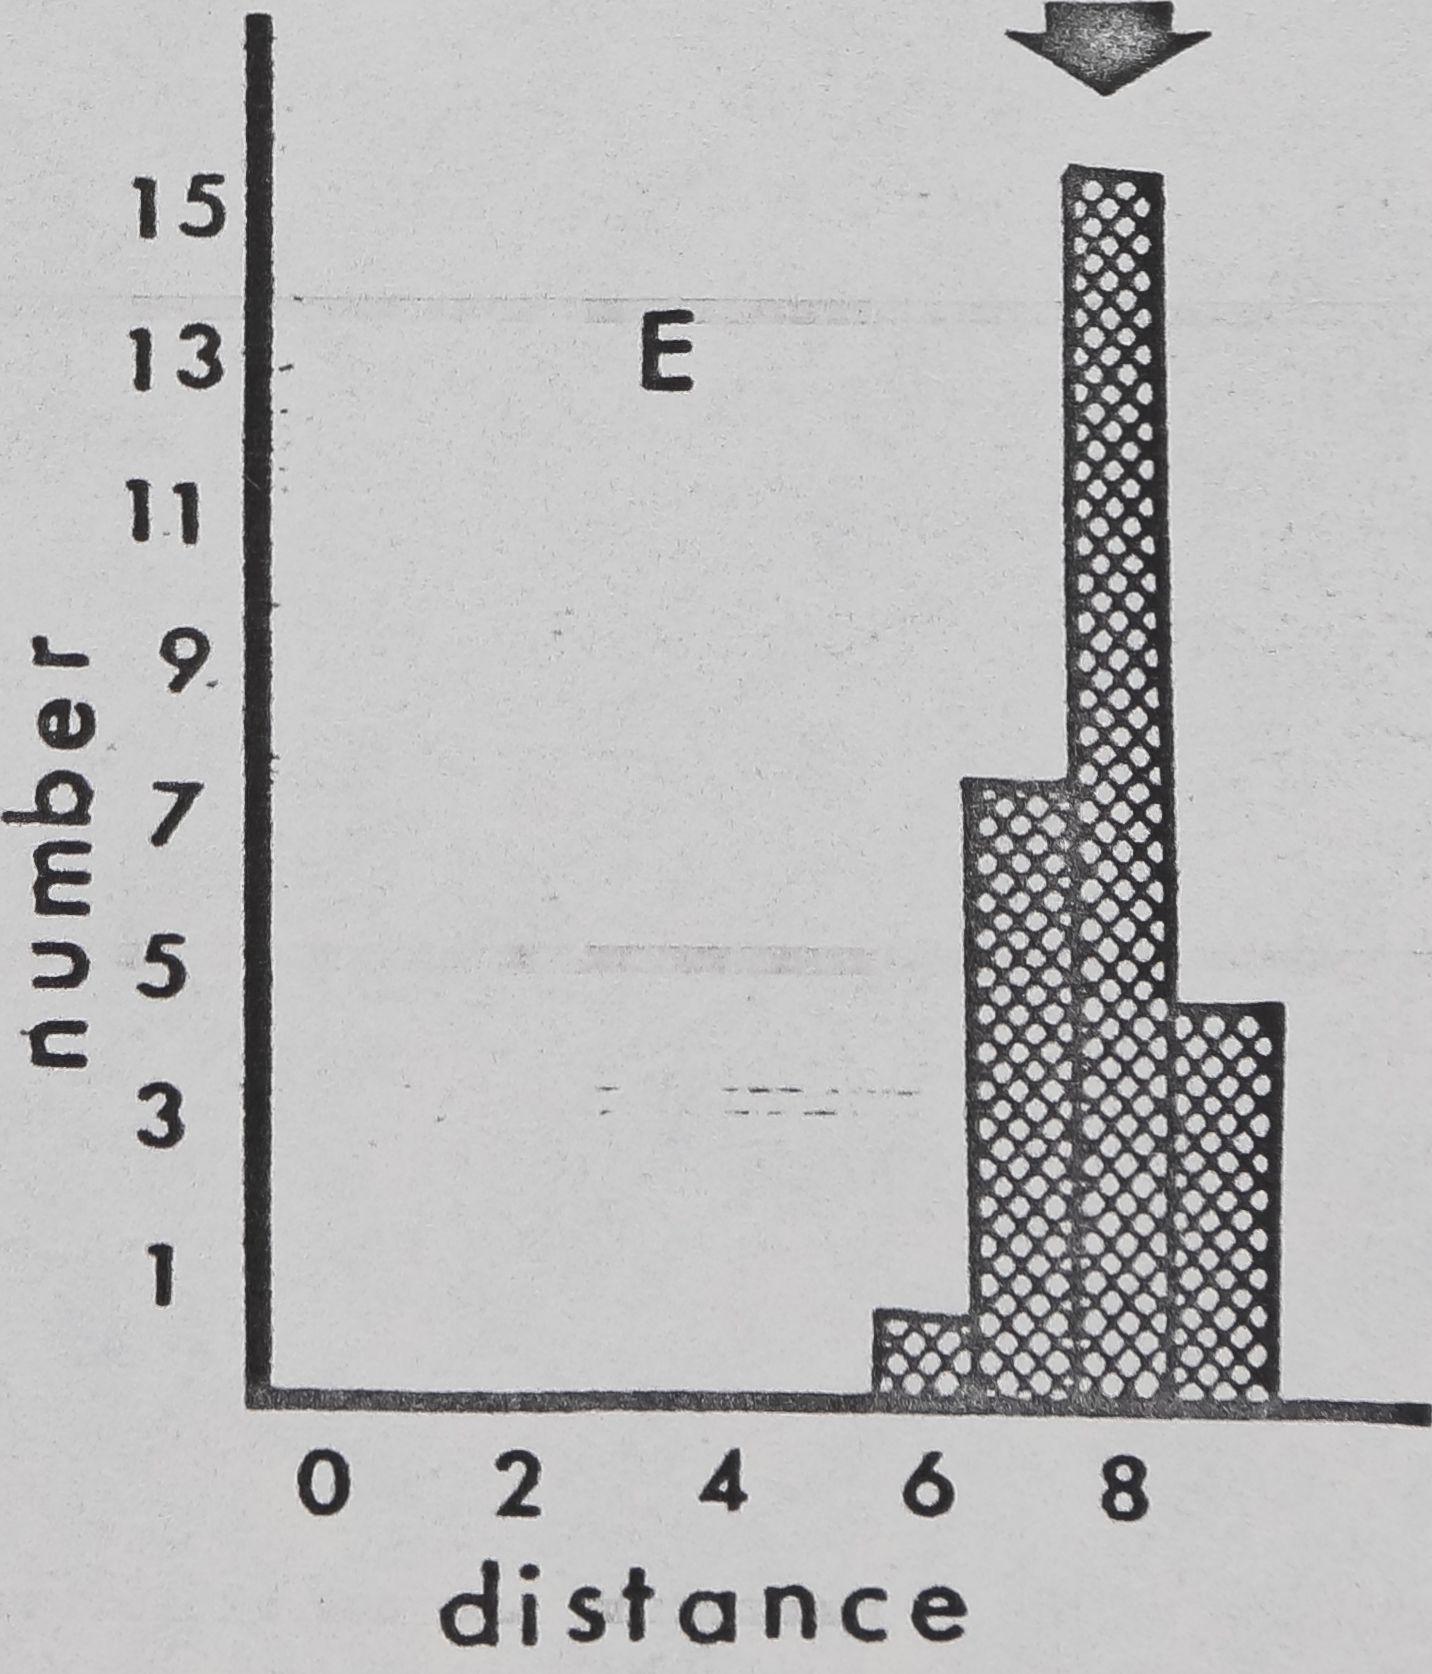 1979-ComparativeStudiesOfDictynaAnd-10